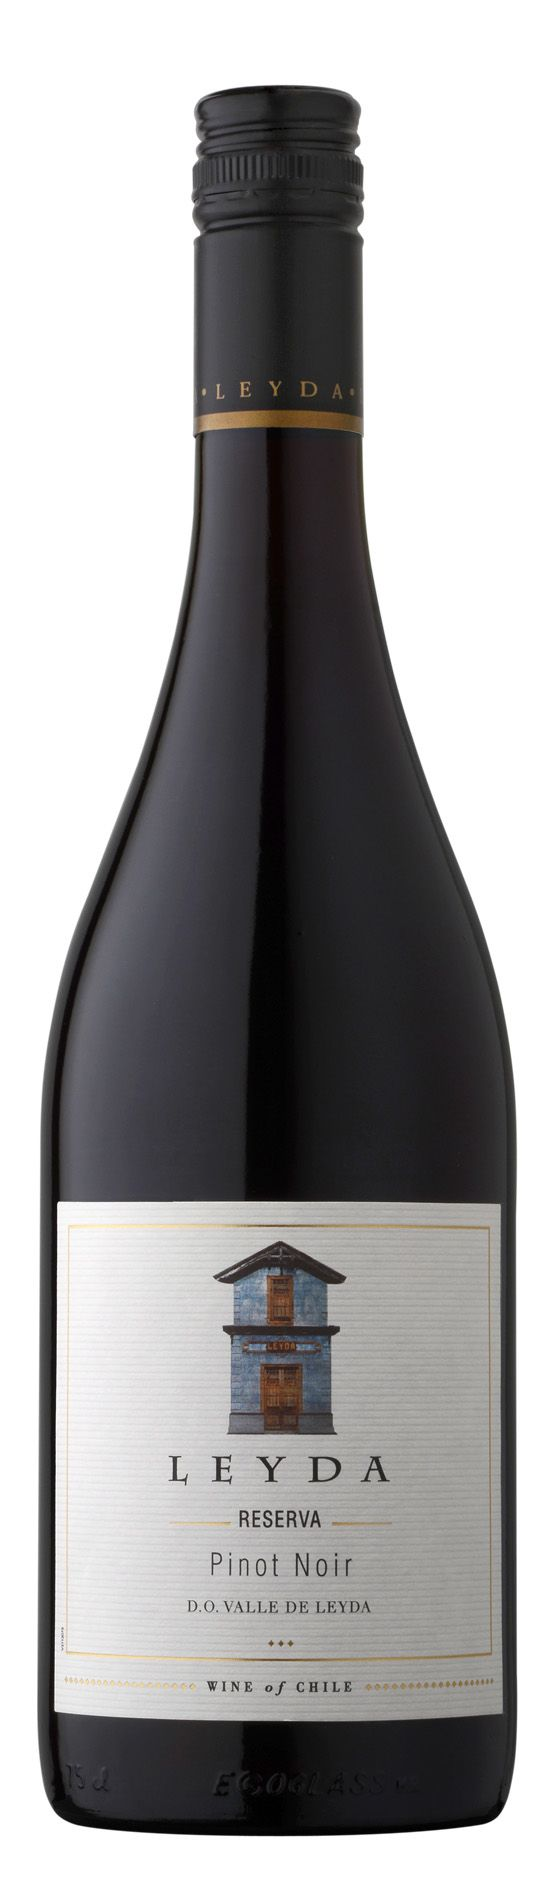 Vinho Leyda Reserva Pinot Noir 375 ml